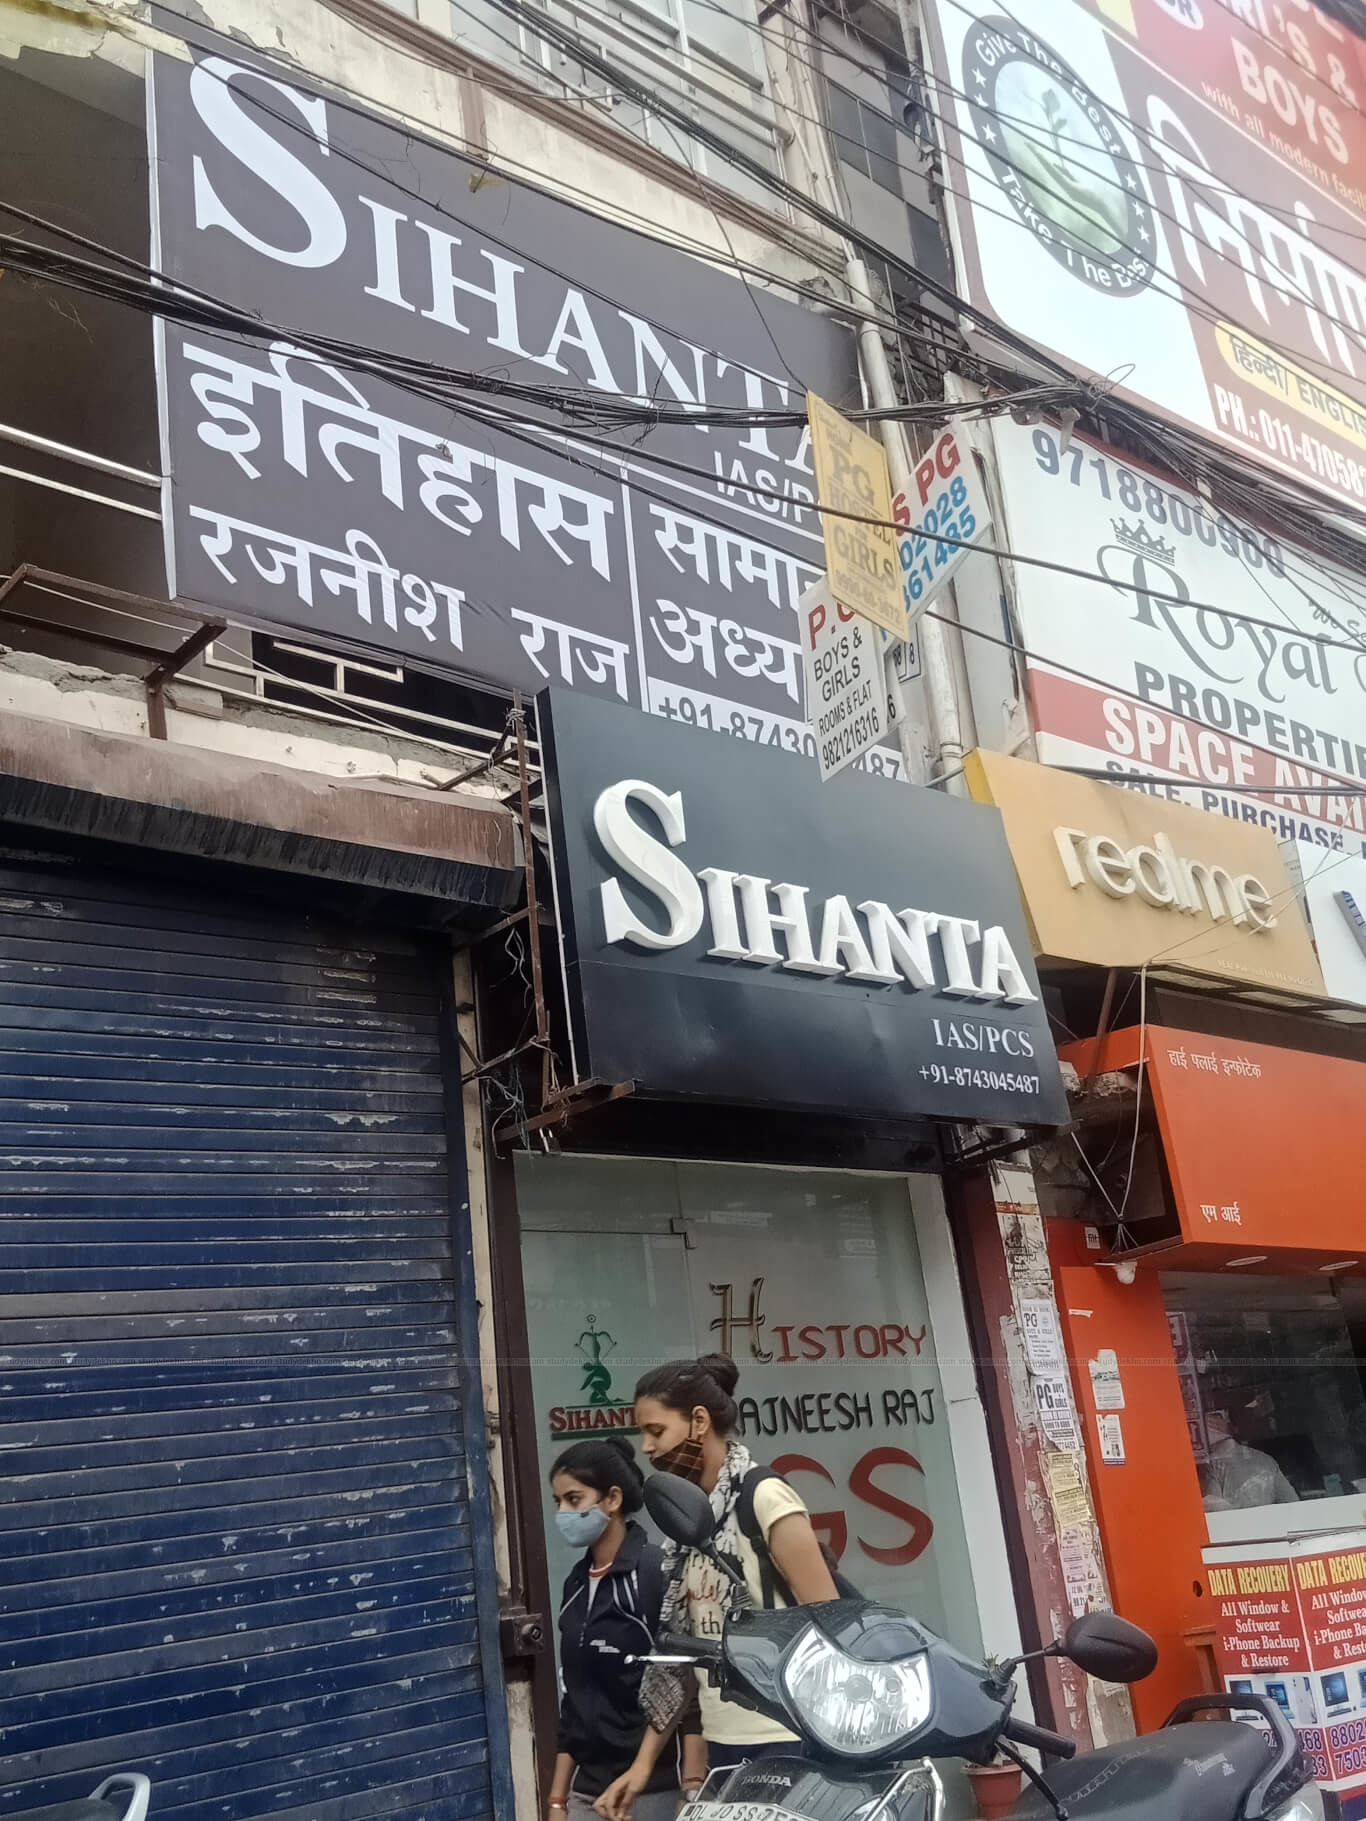 SIHANTA IAS Gallery